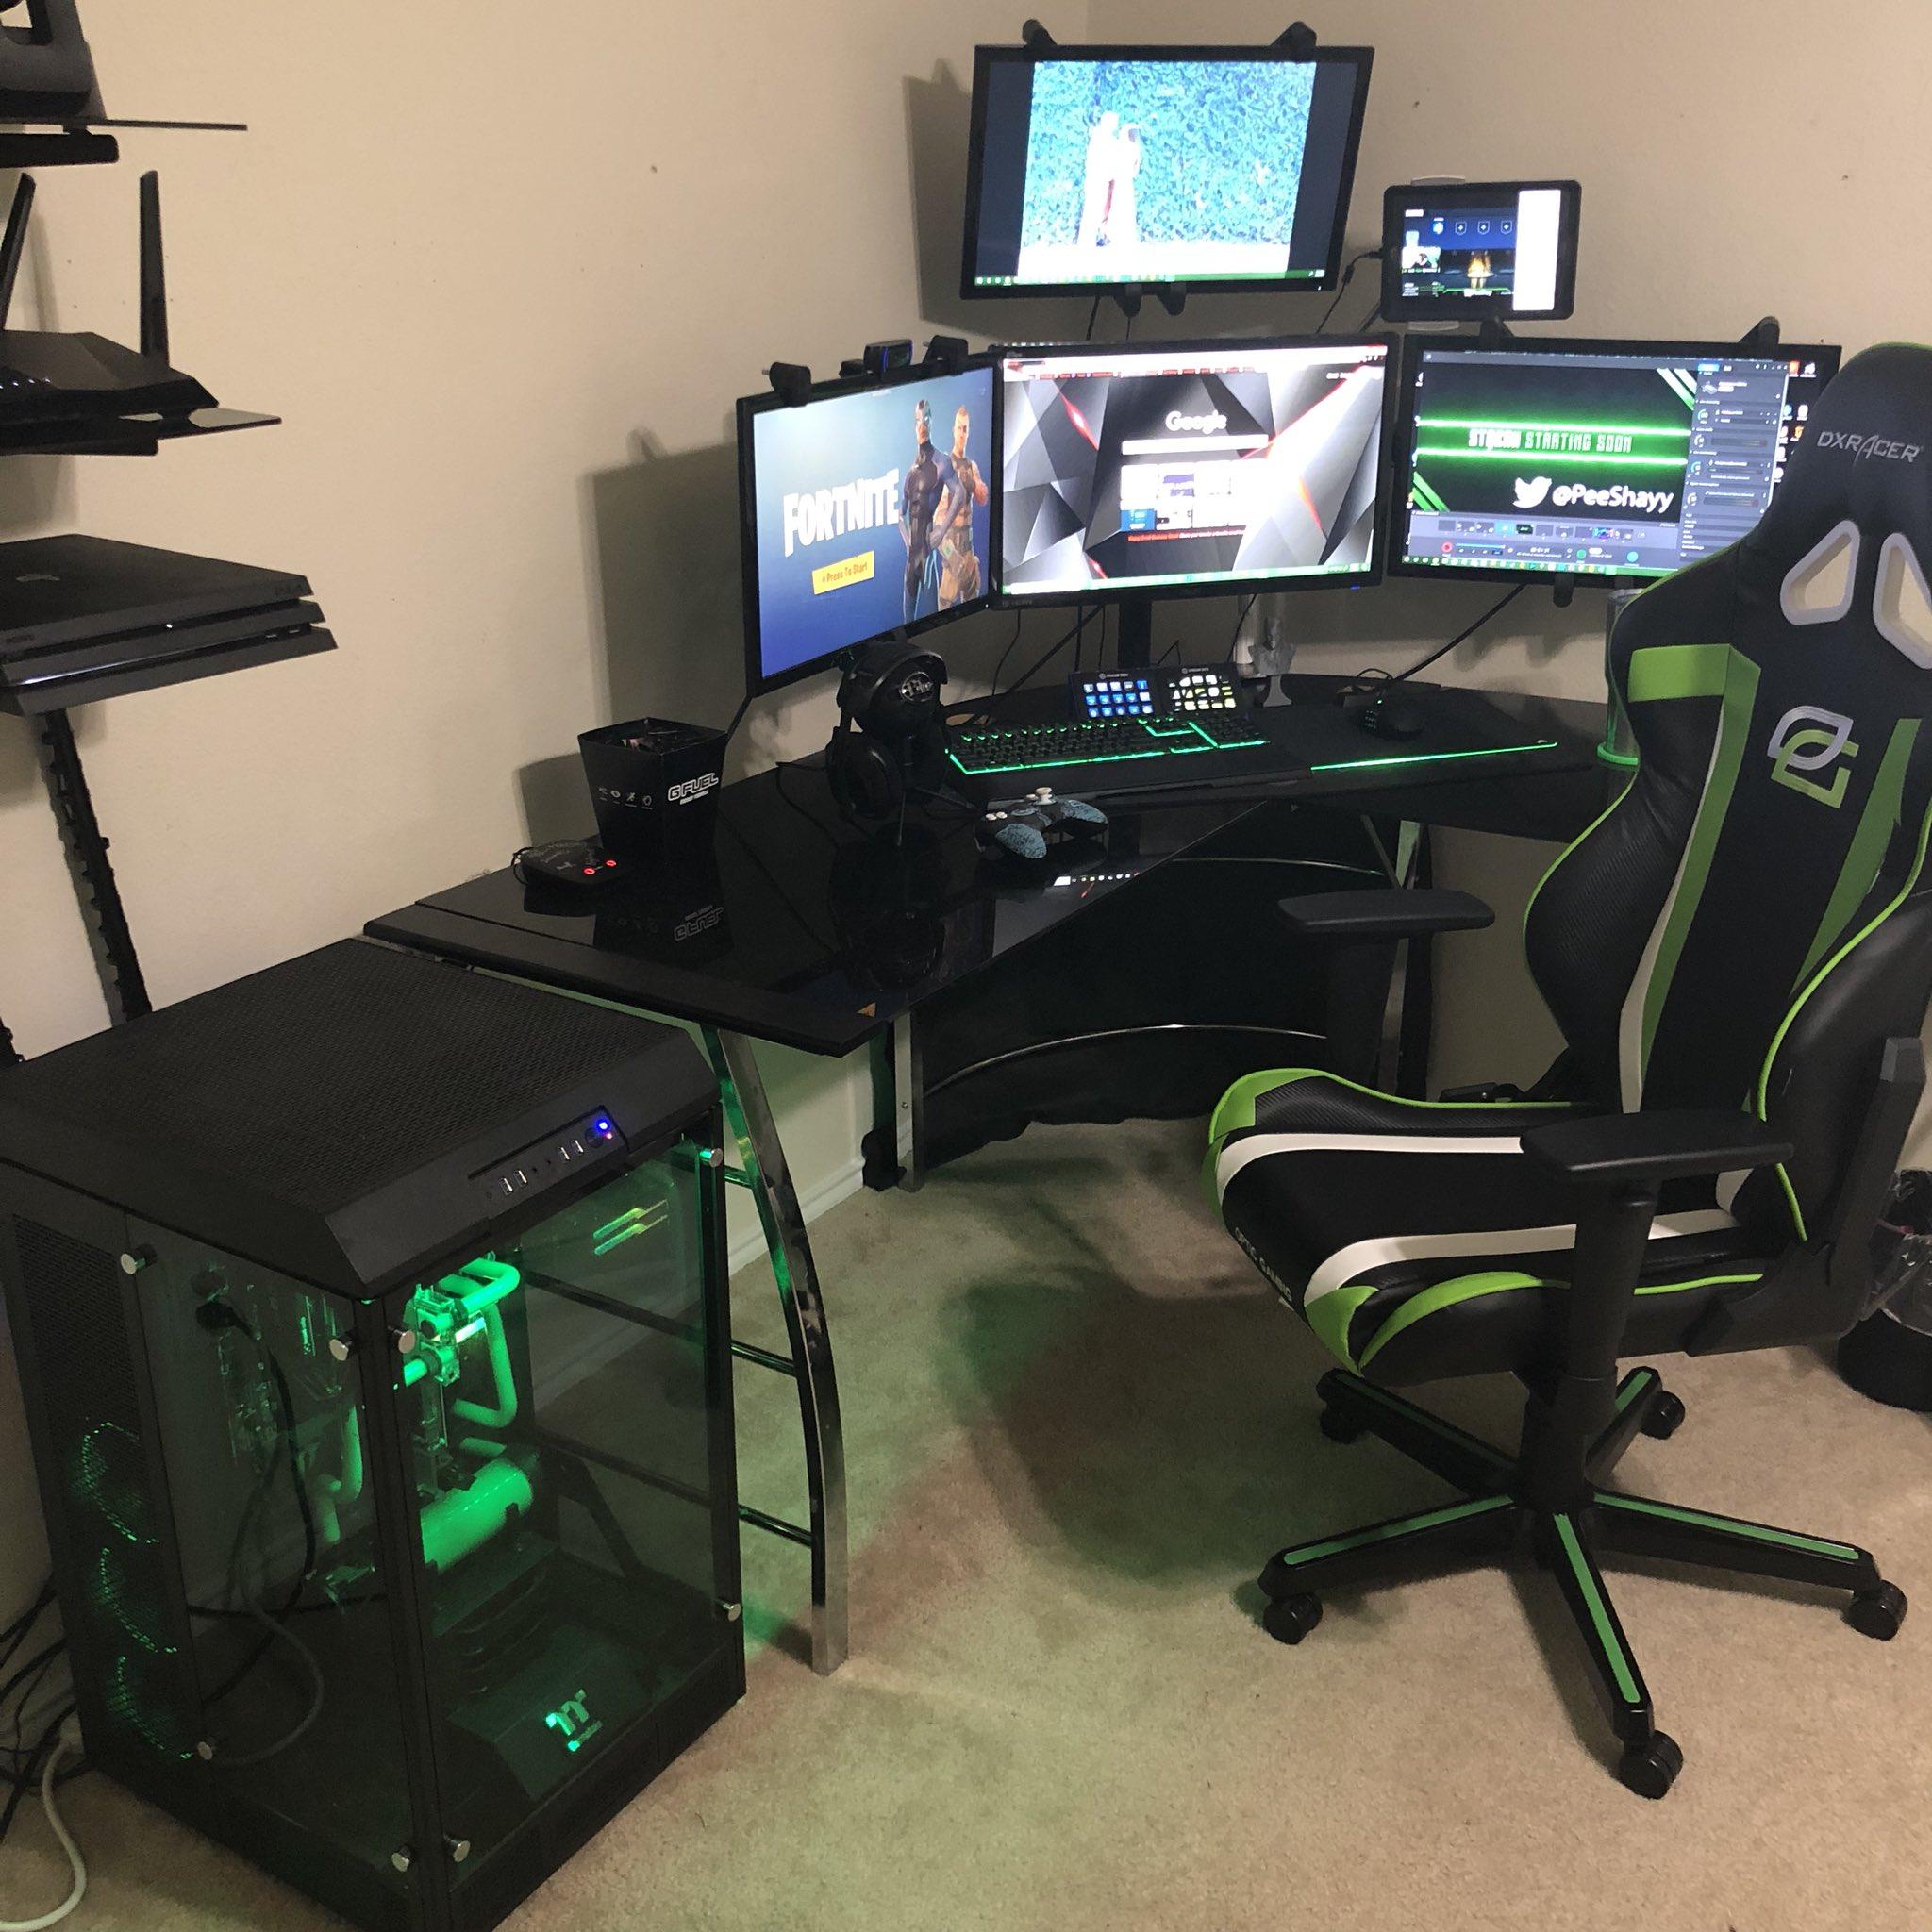 Pete PeeShay Webb on Twitter New gaming room setup